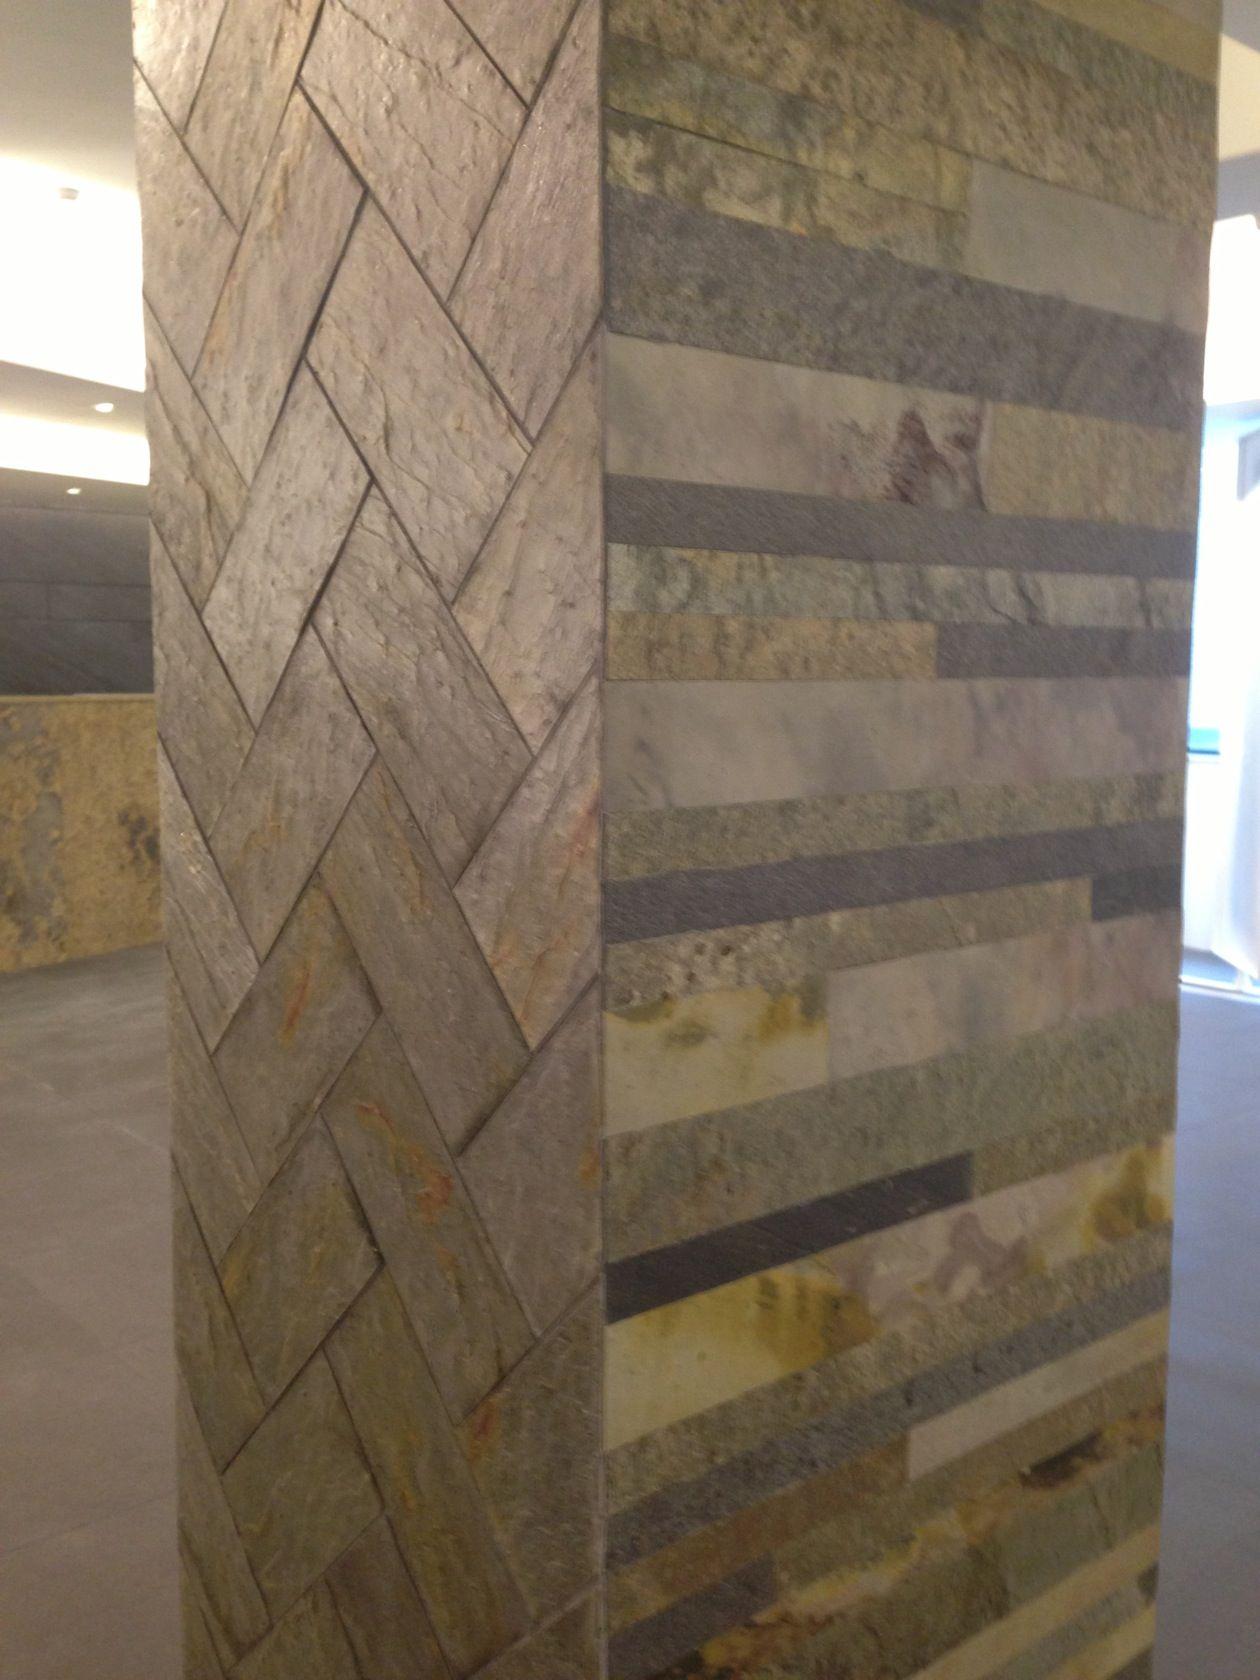 Slate veneer tile sheet wall colu,n cladding, mixed tile pattern ...